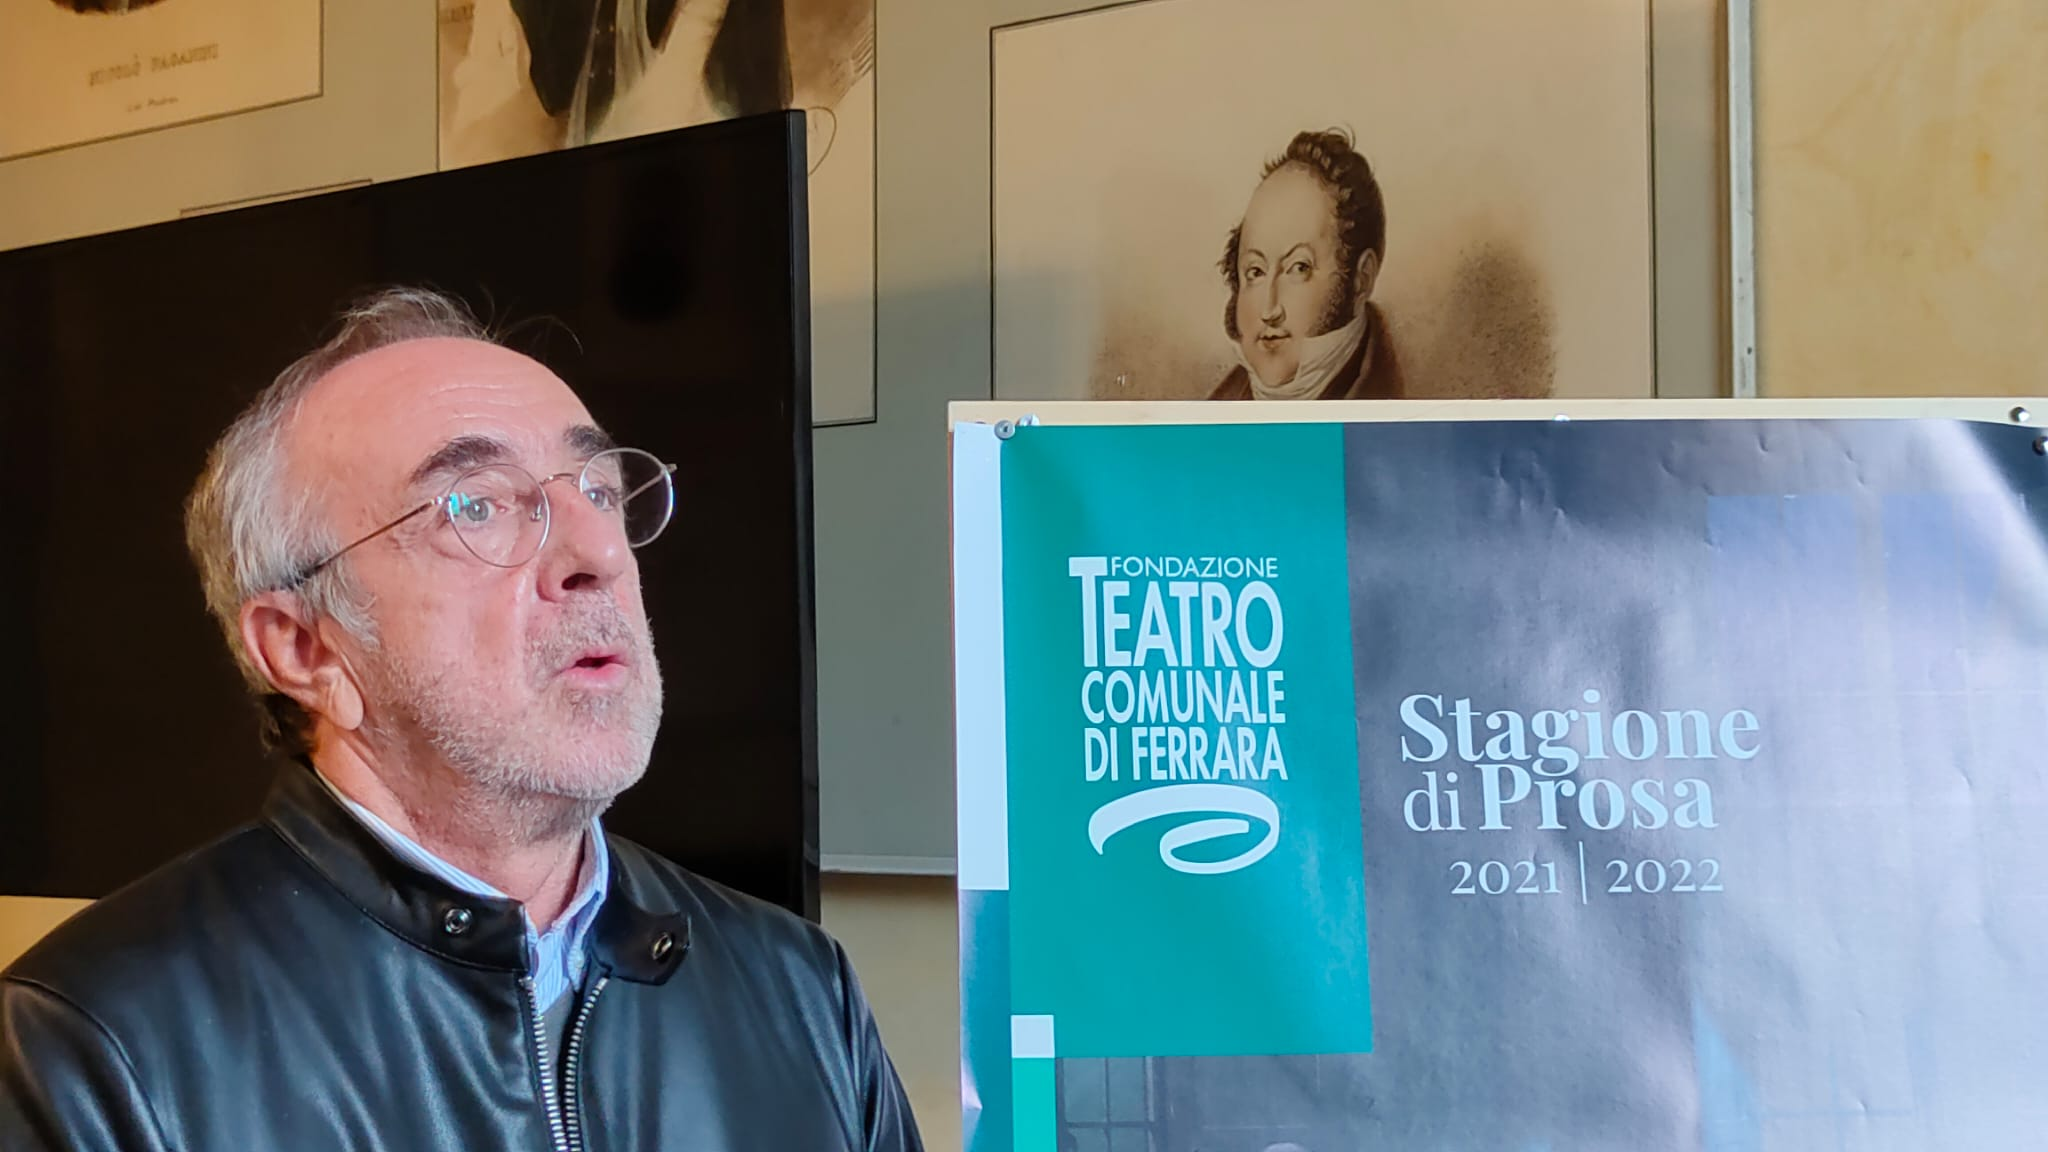 Teatro Comunale Ferrara silvio orlando